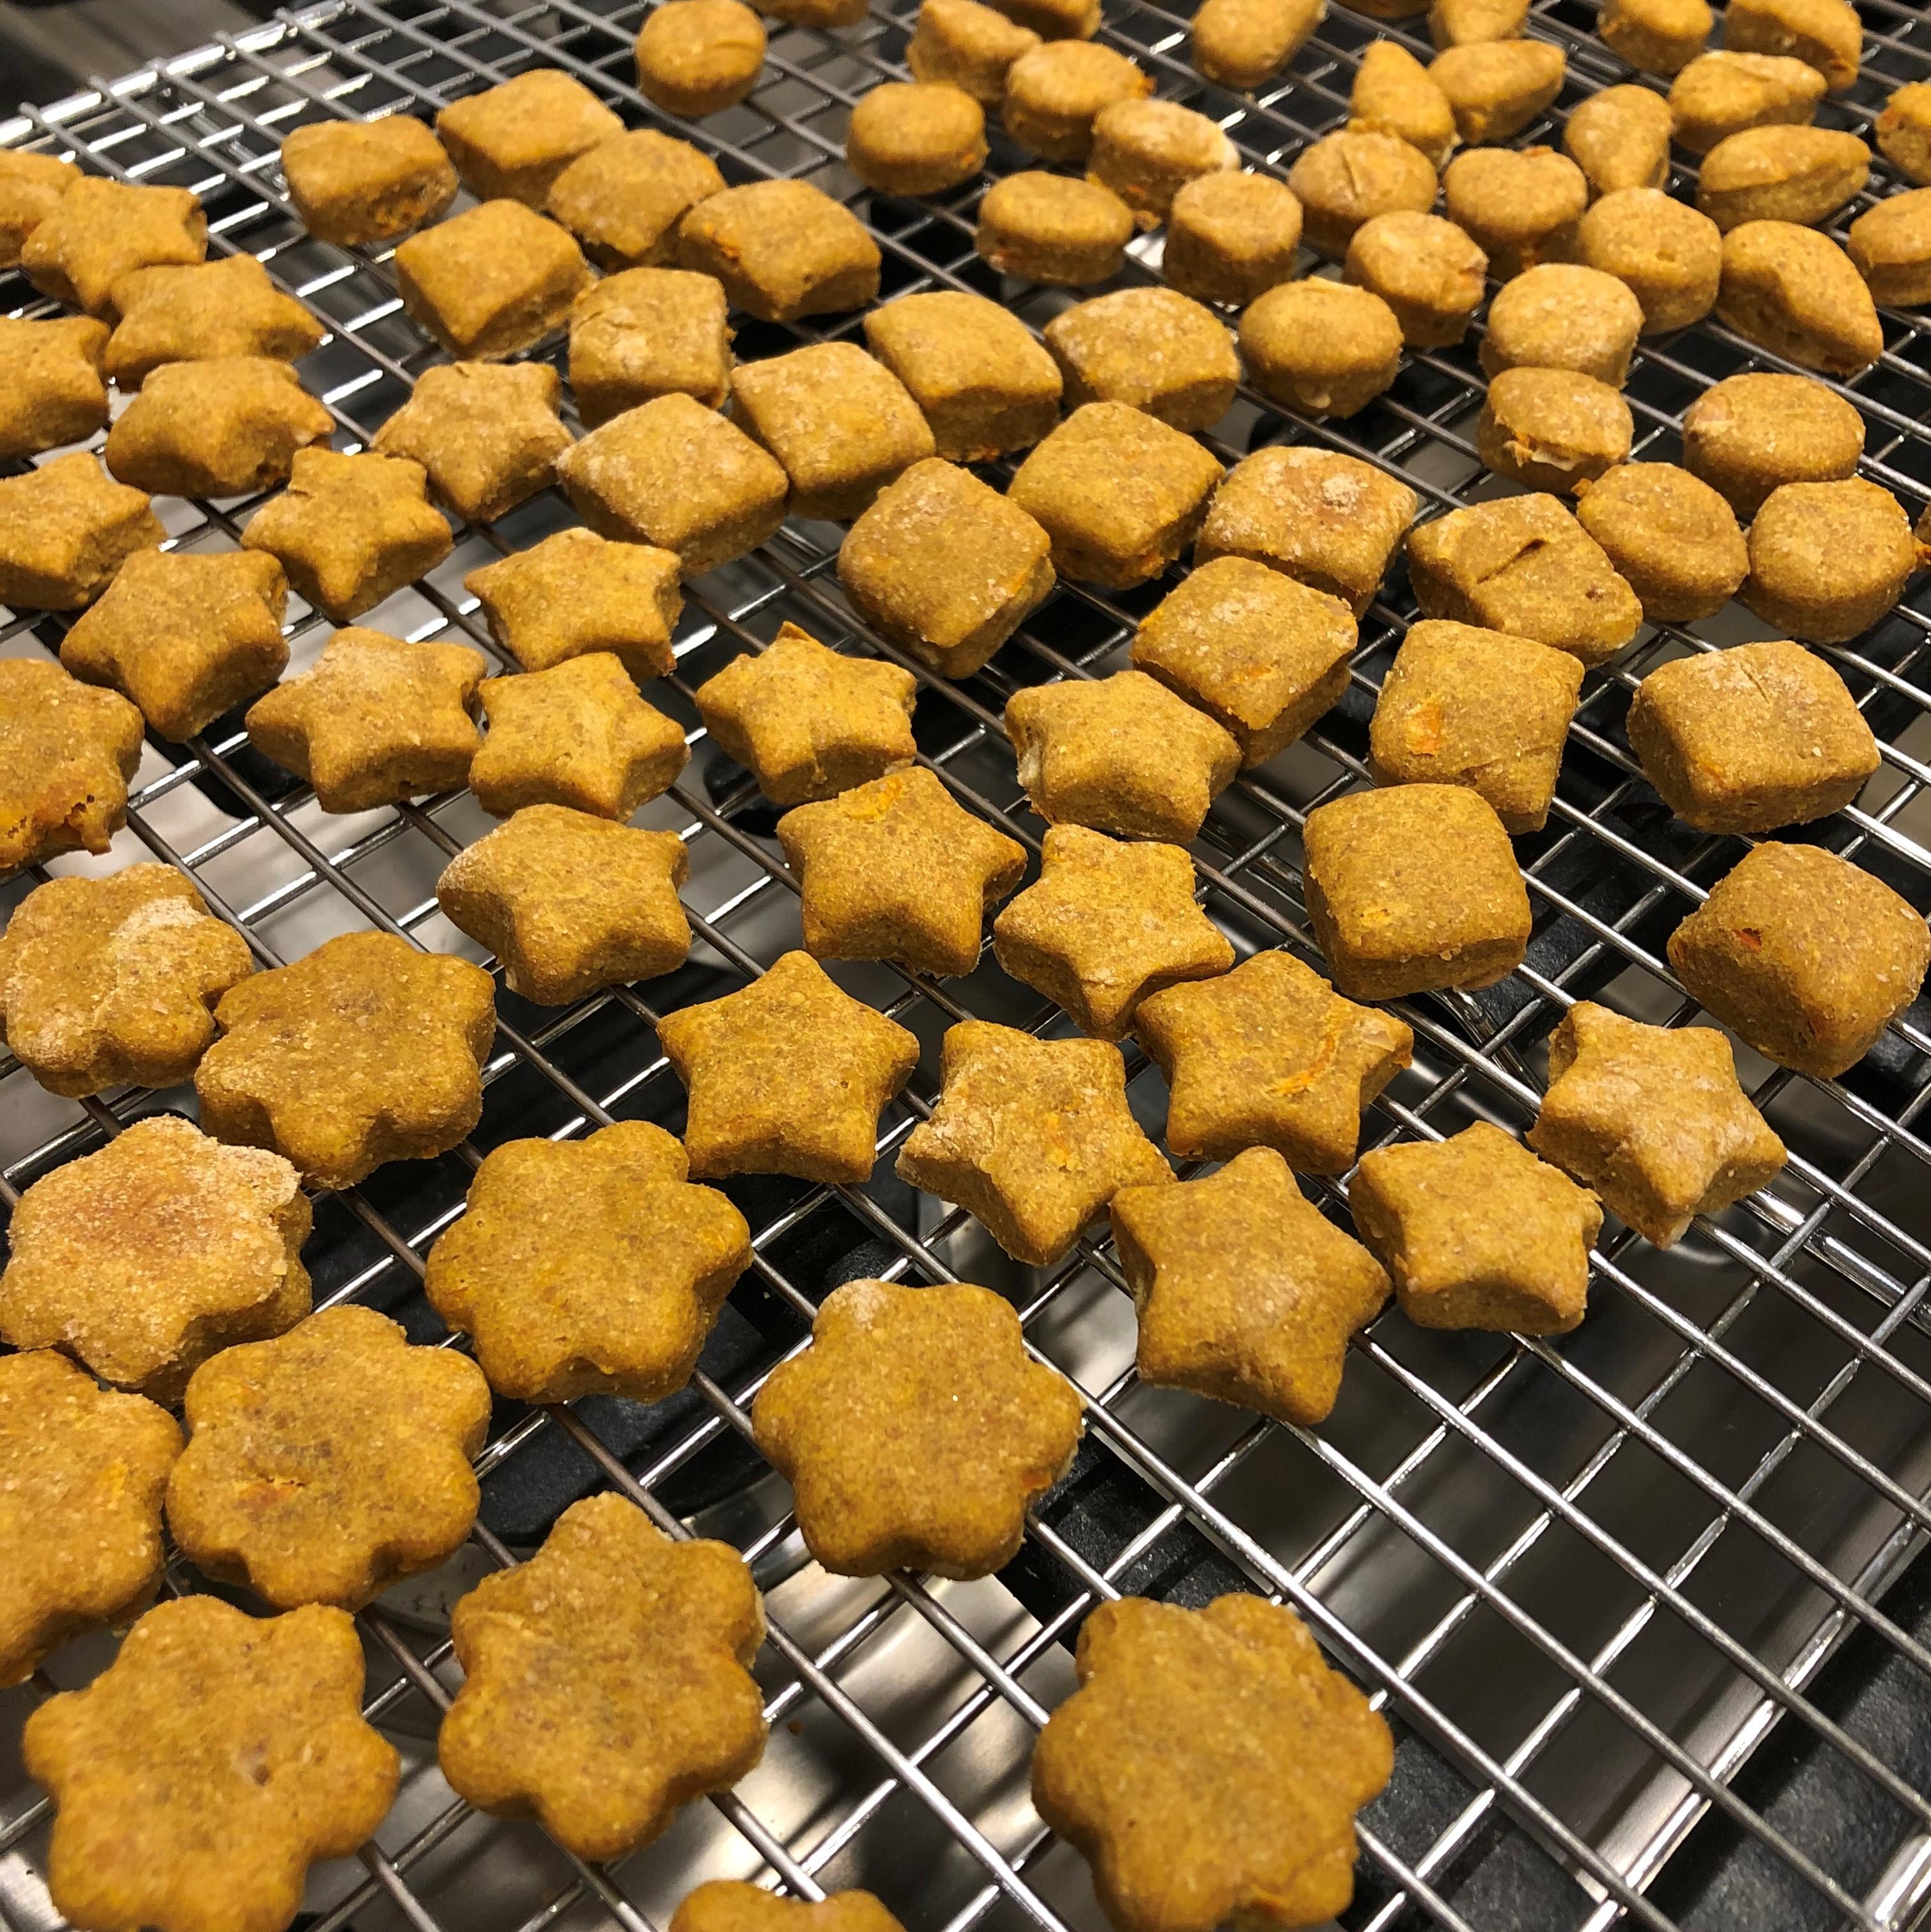 Peanut Butter and Carrot Dog Treats jaybu